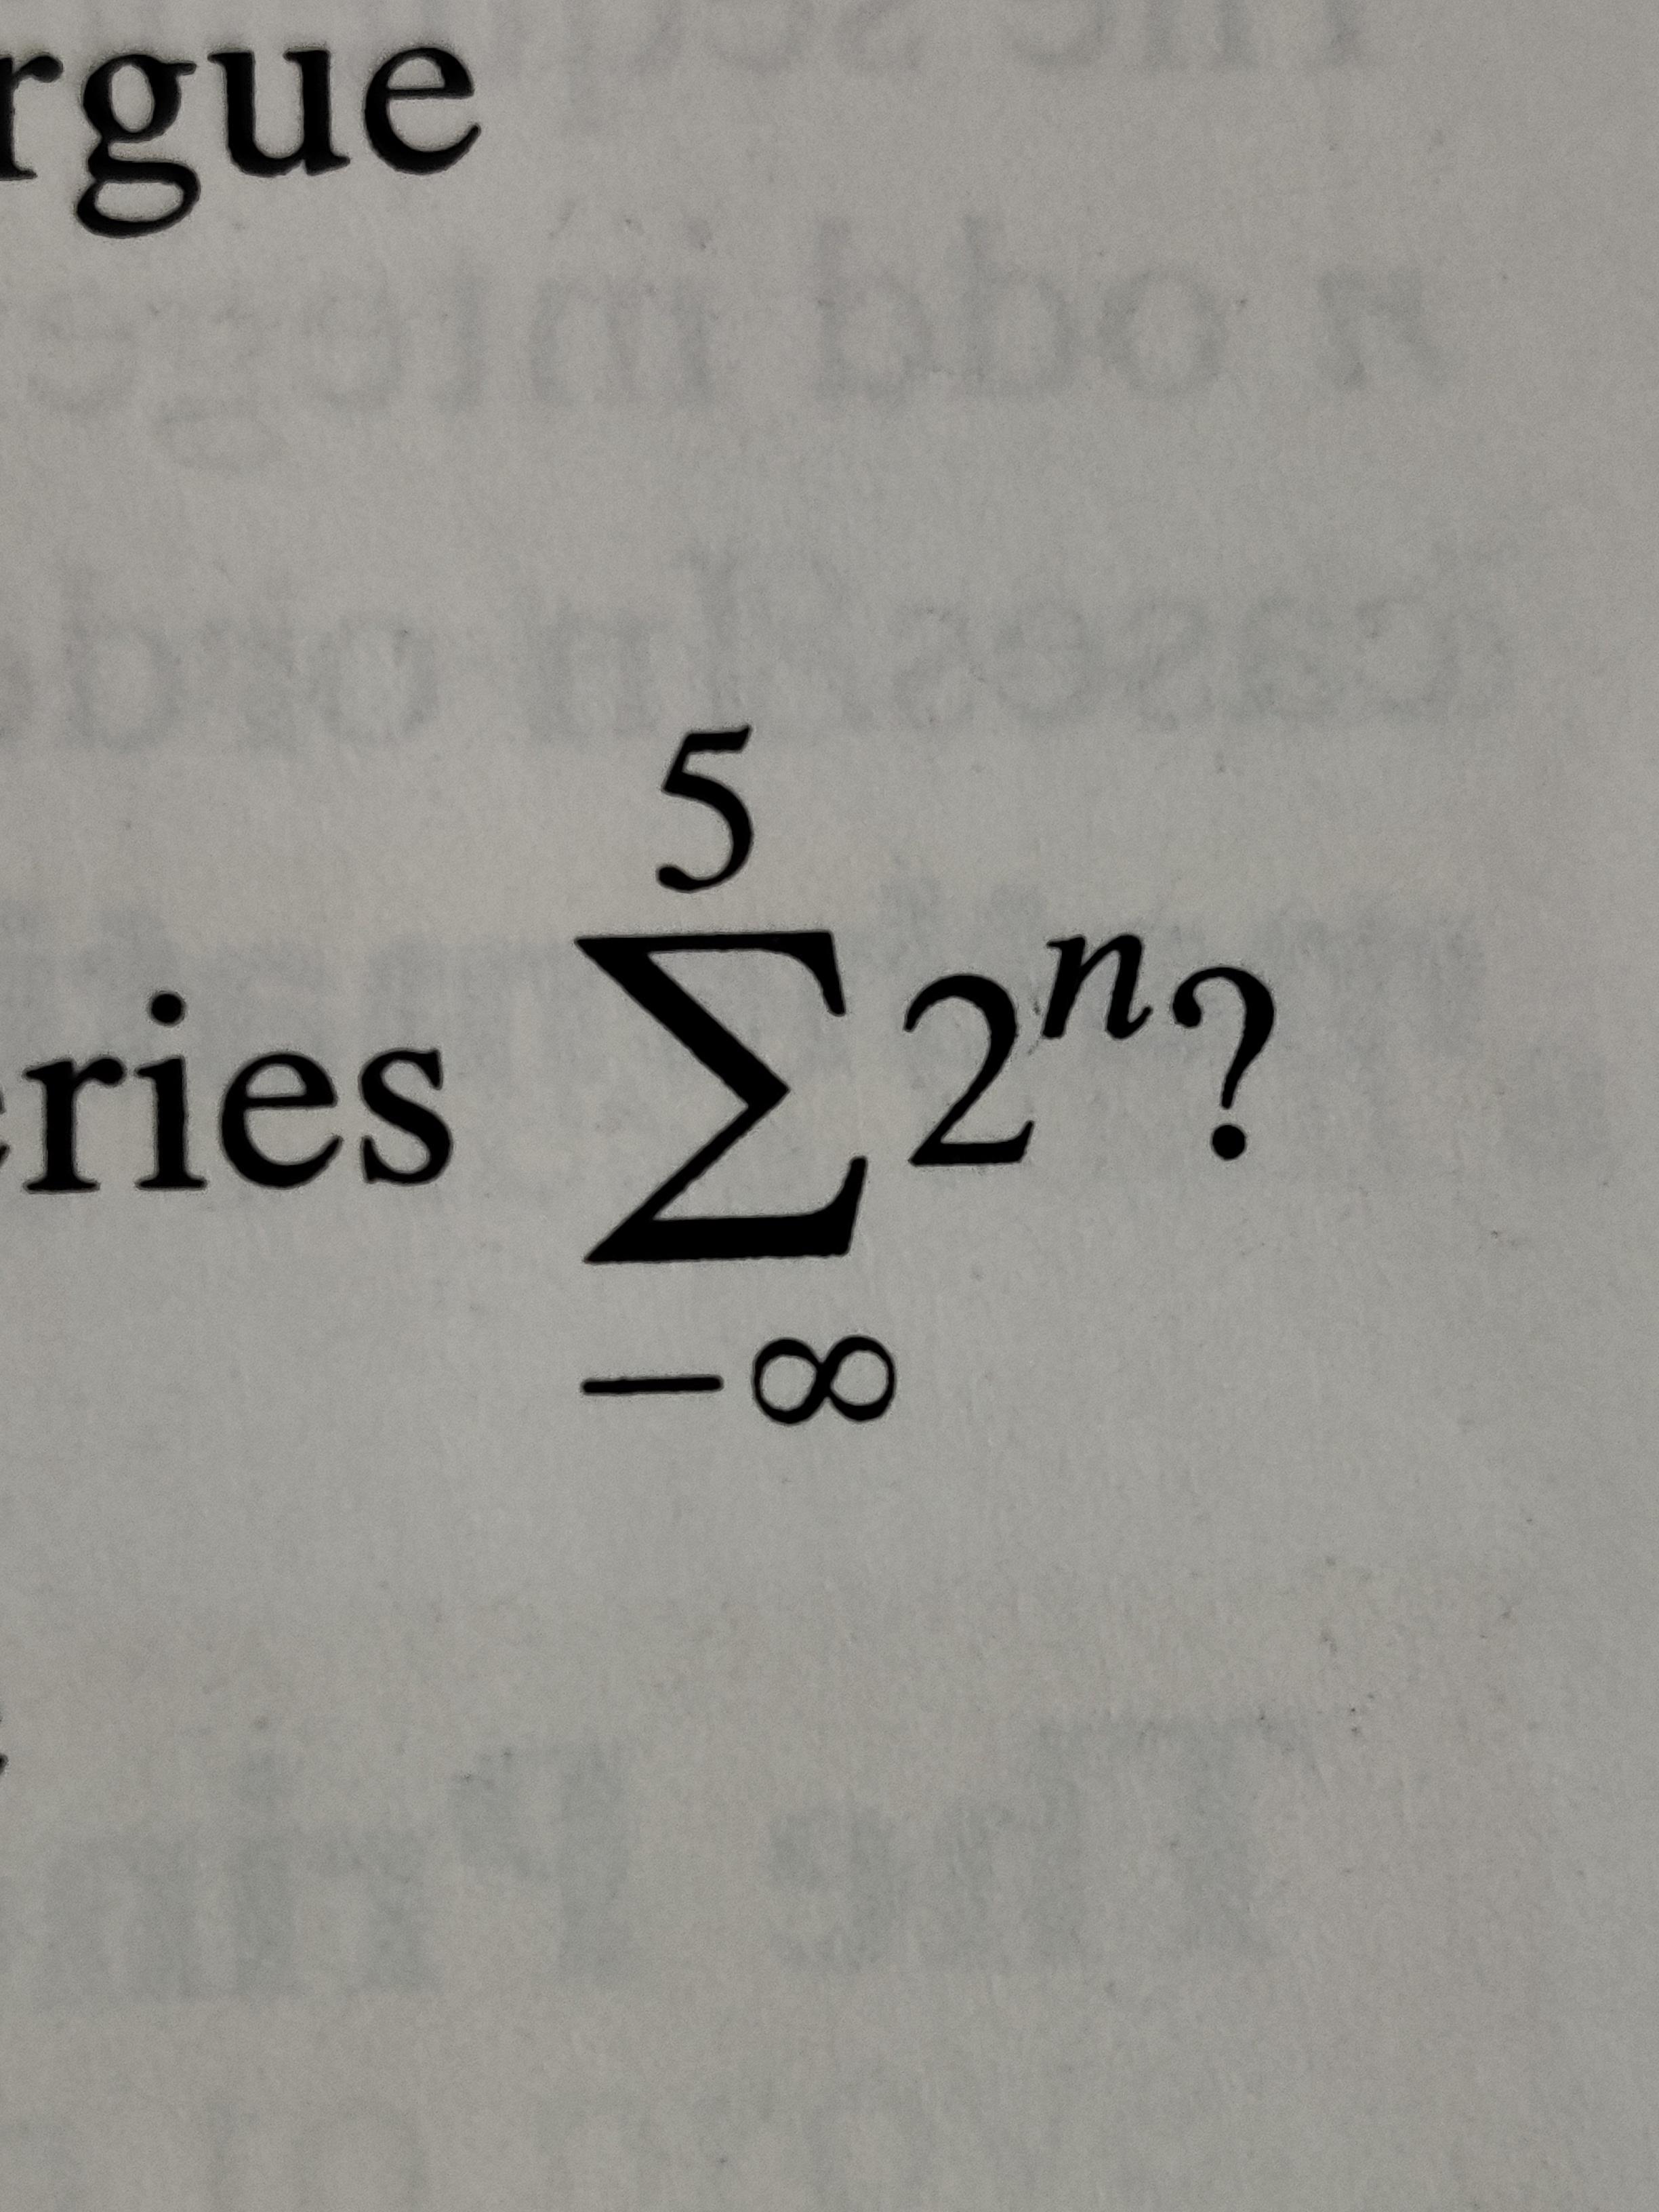 ([High School Math] Geometric Series) I know the sum is 64